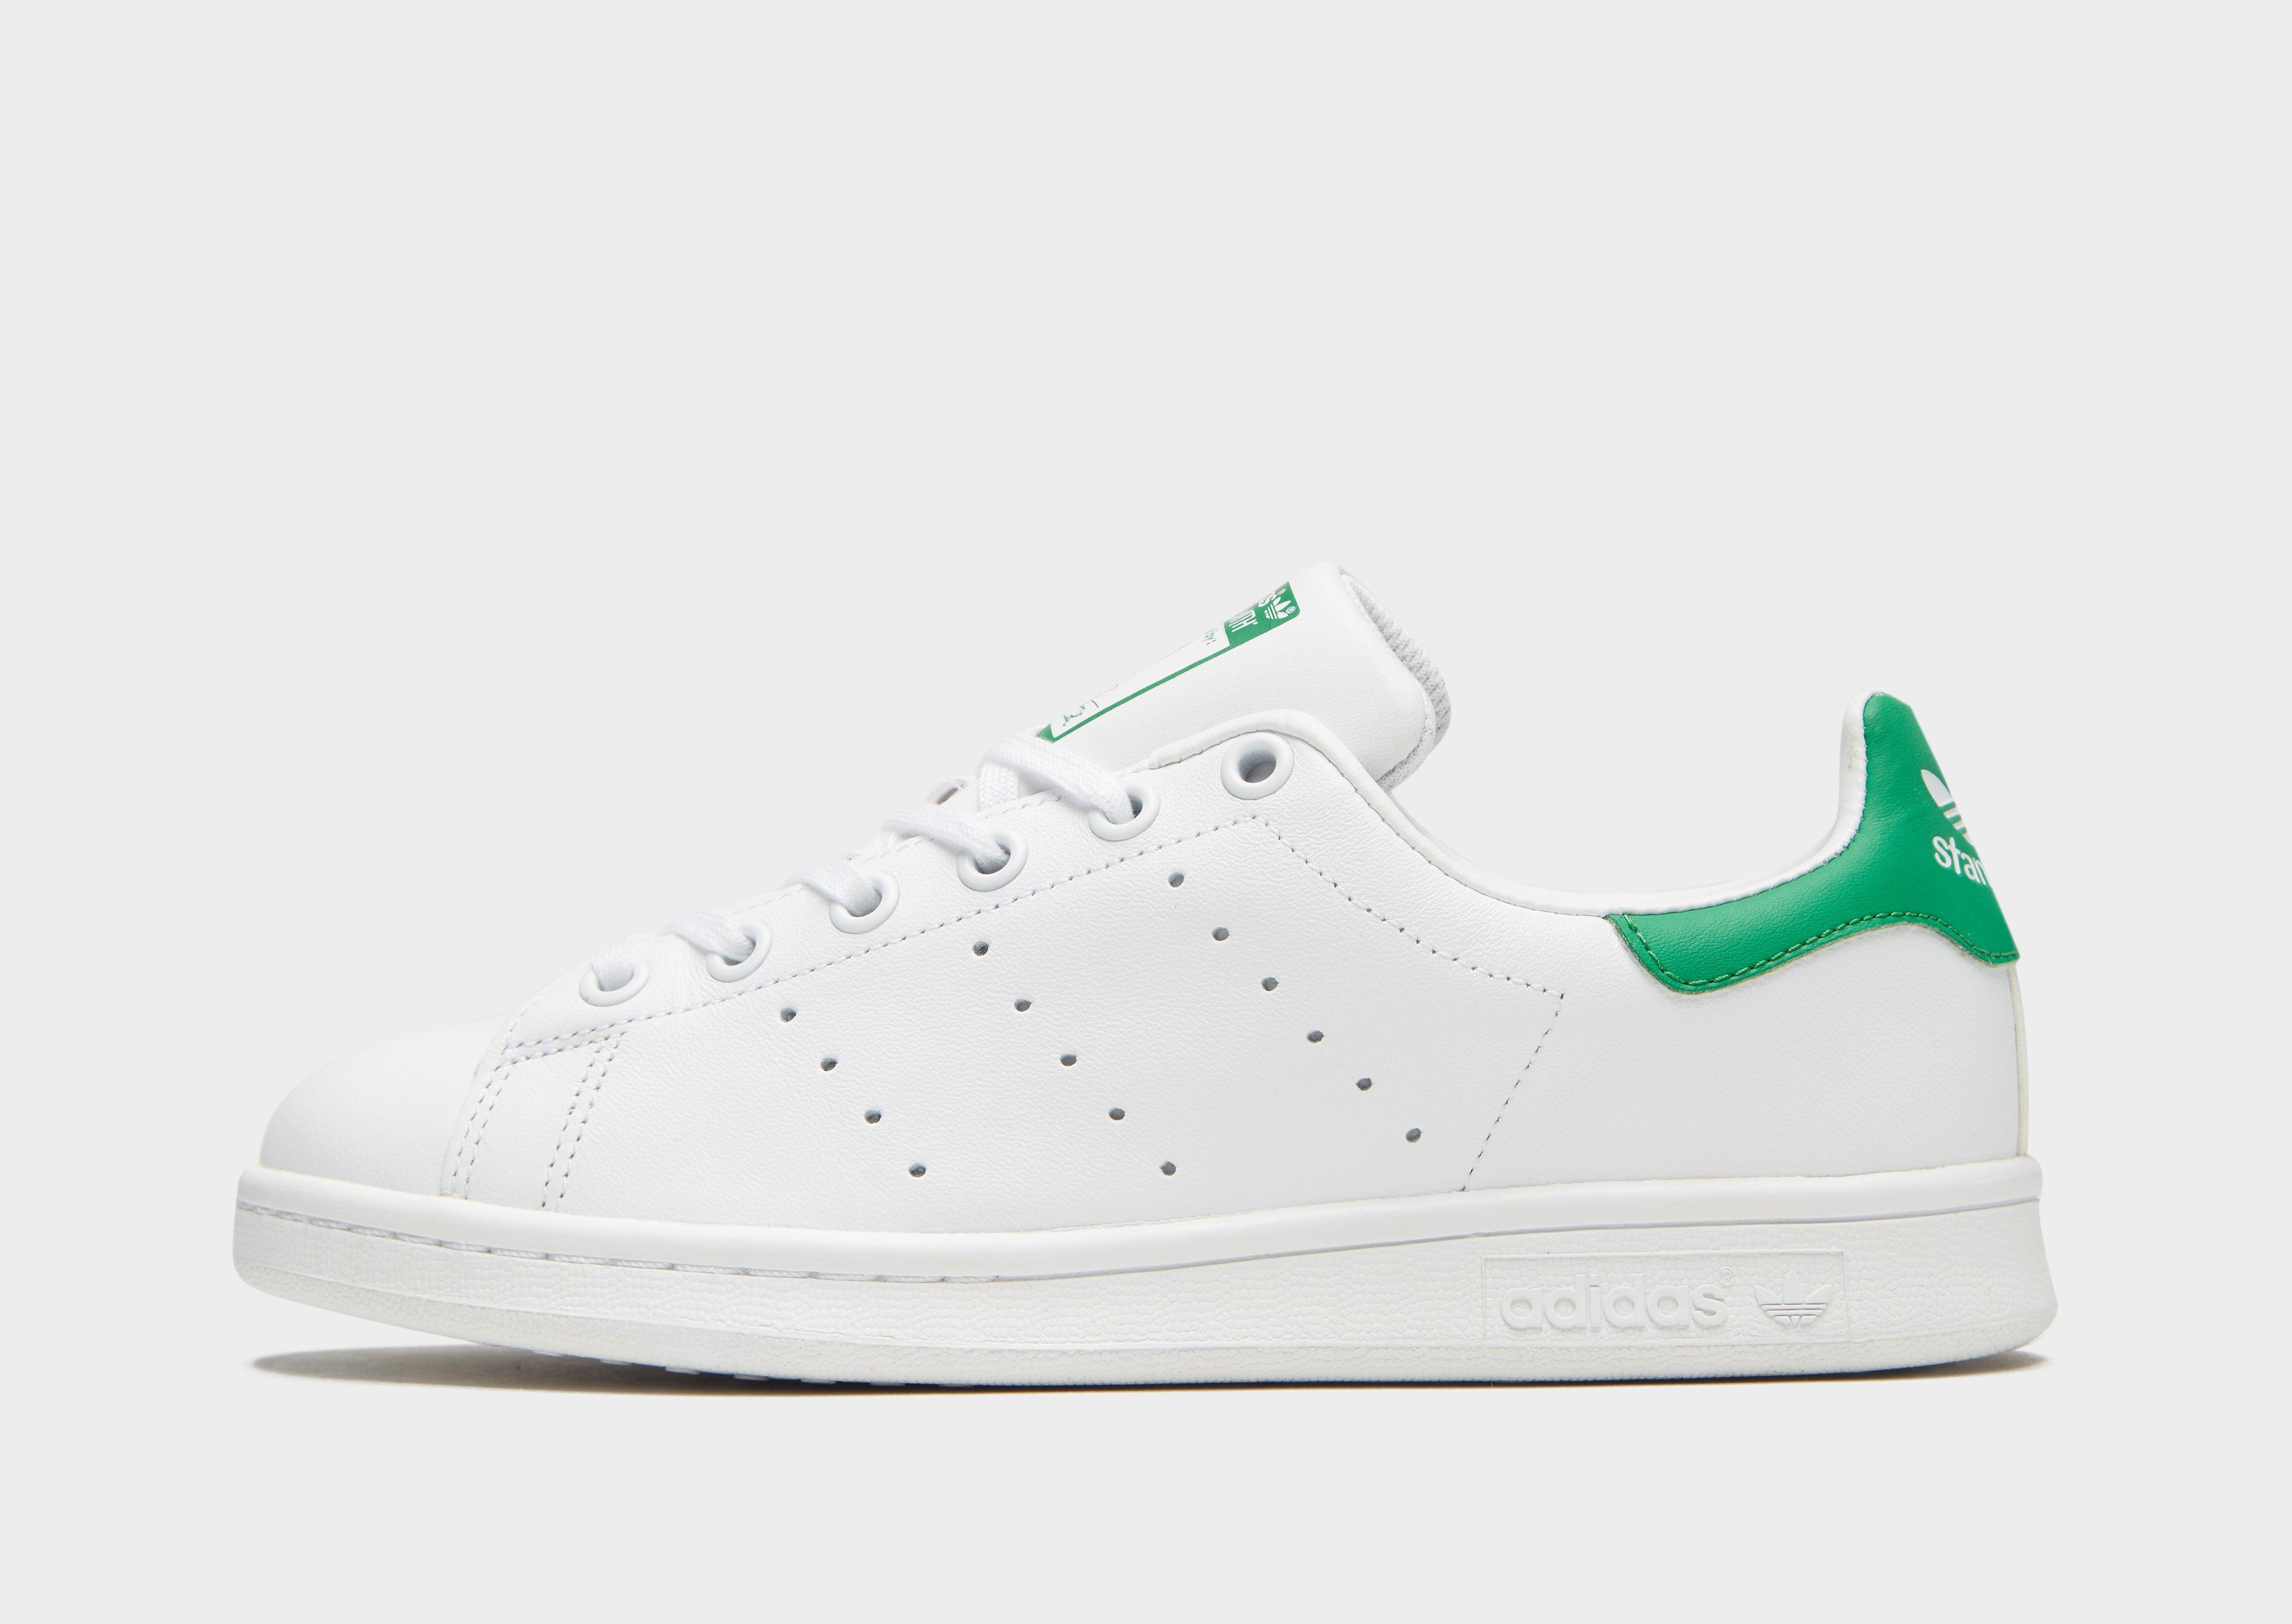 adidas ultra boost 40 triple black uk adidas shoes women stan smith green